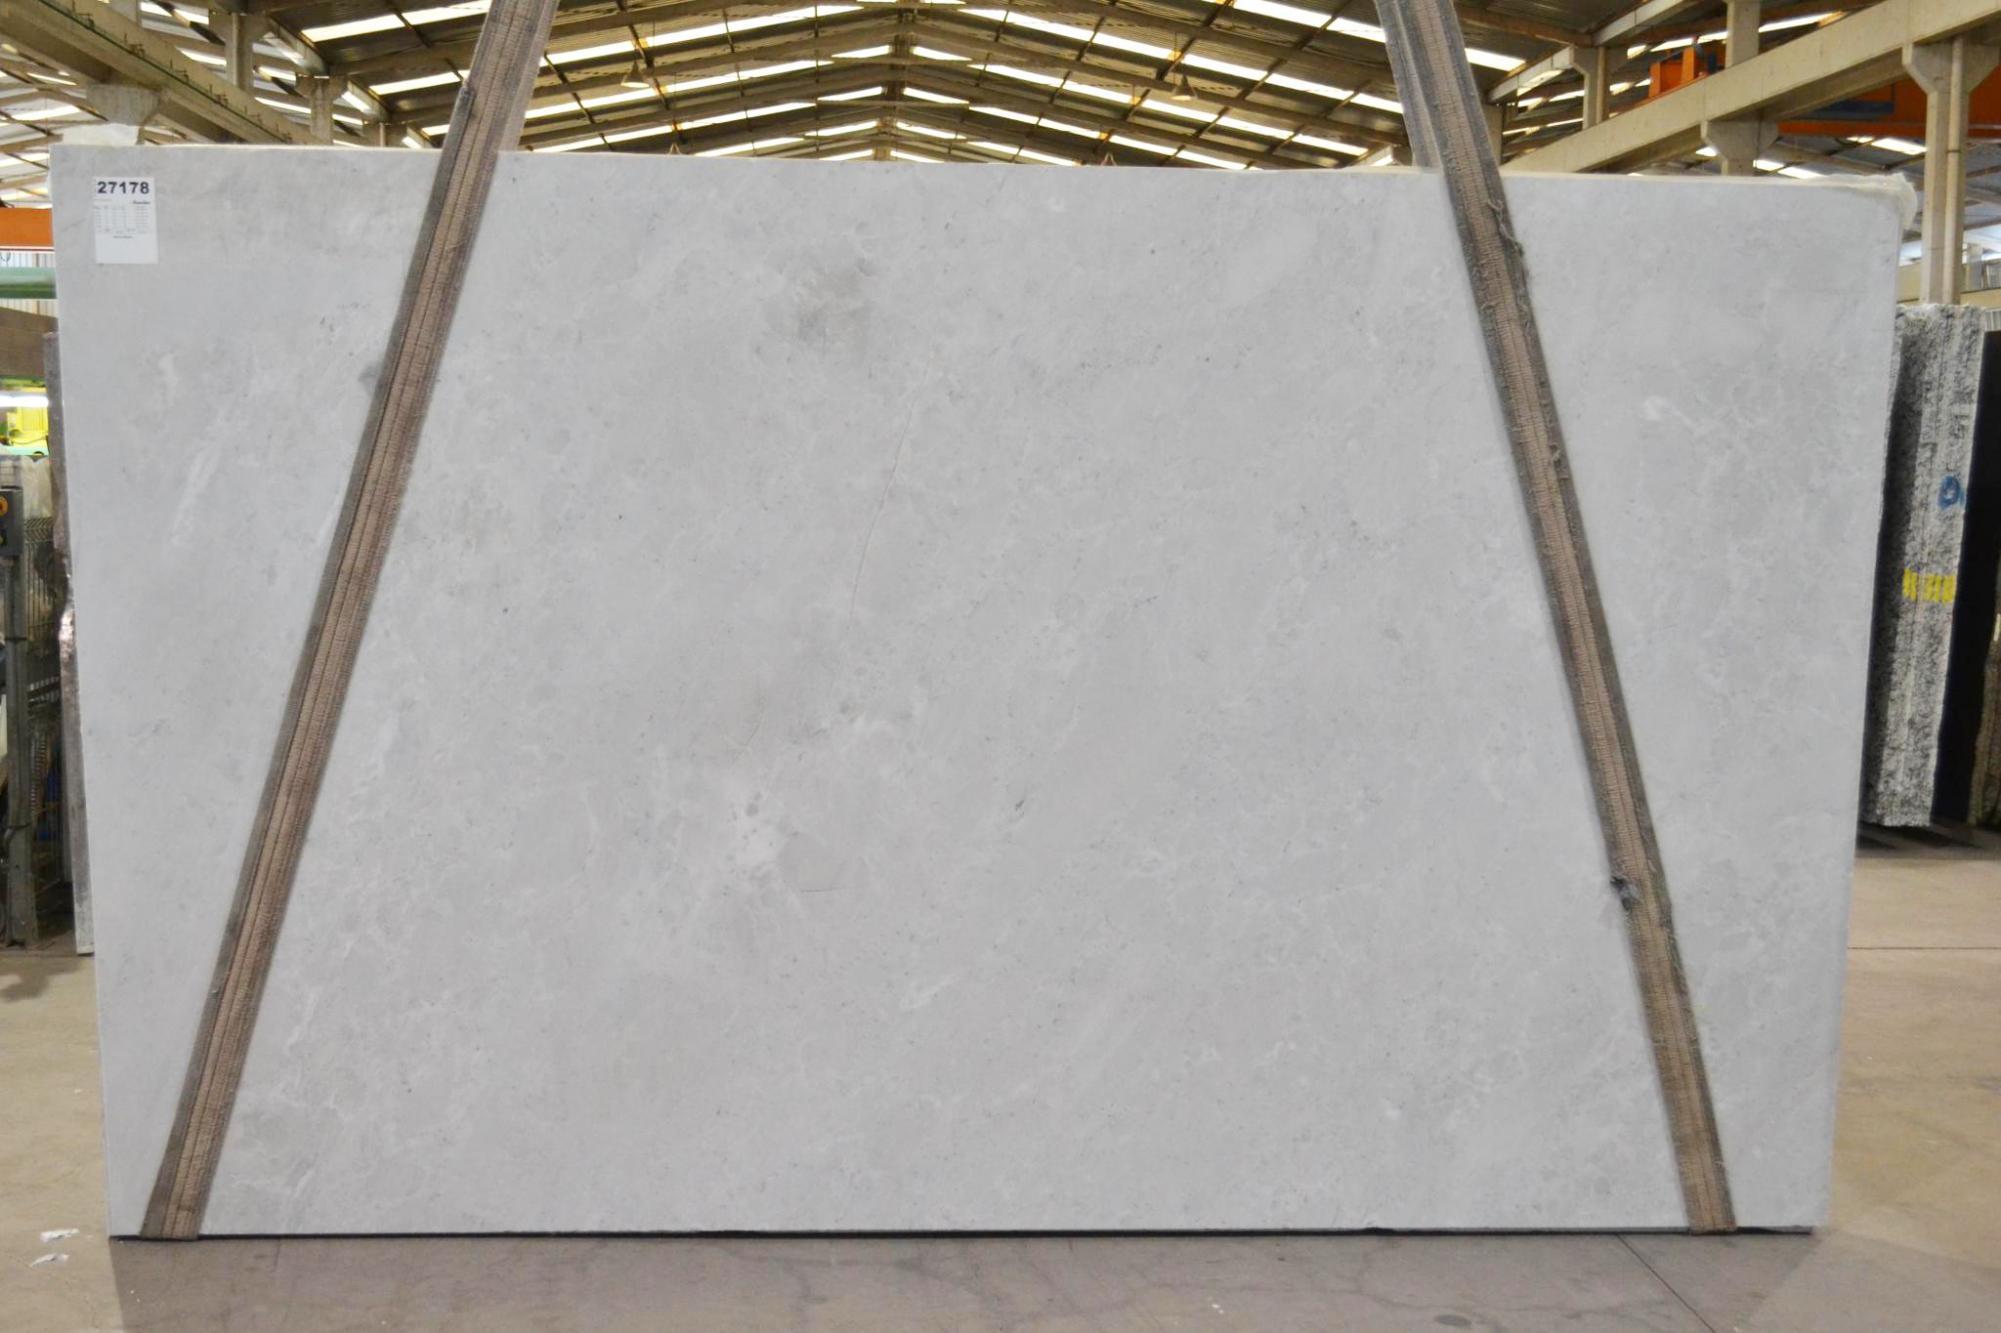 Brazilian Dolomite Supply Espirito Santo (Brazil) polished slabs 2465 , Bnd #27178 natural Dolomite